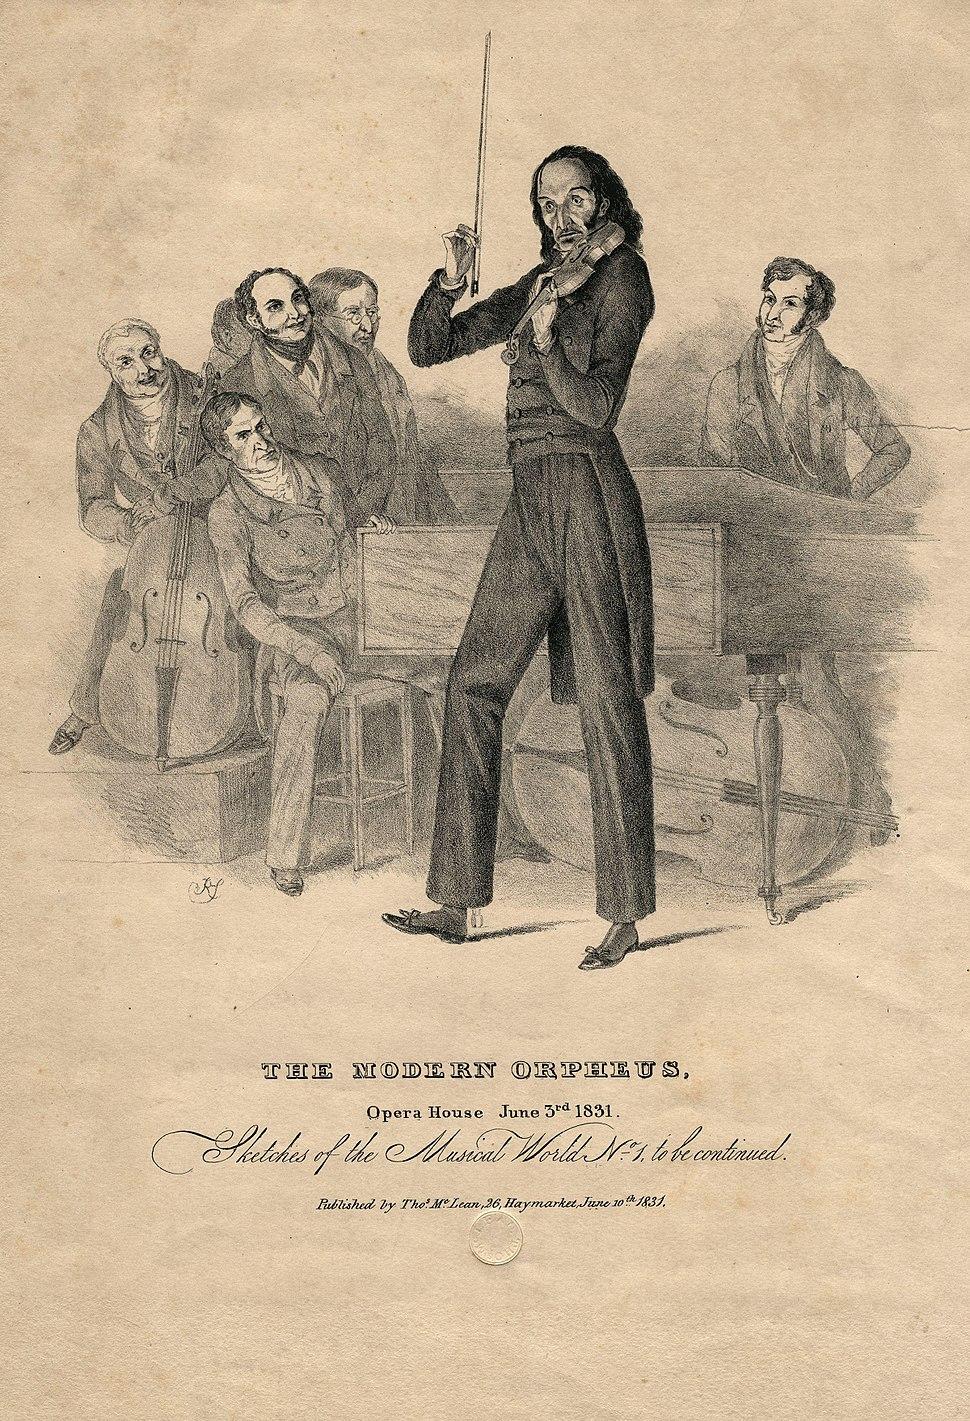 Nicolo Paganini by Richard James Lane